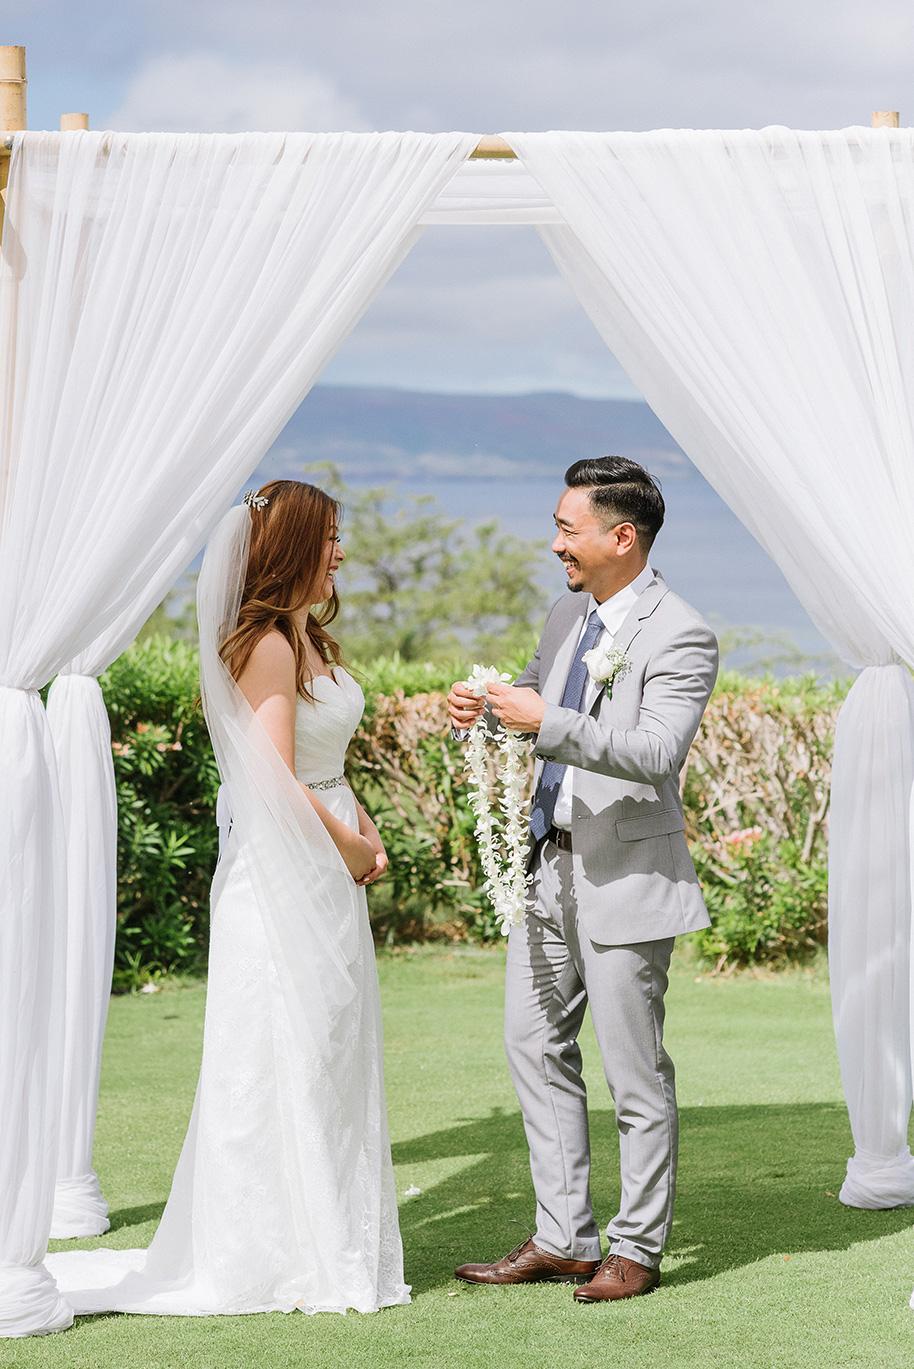 Maui-Wedding-052416-12